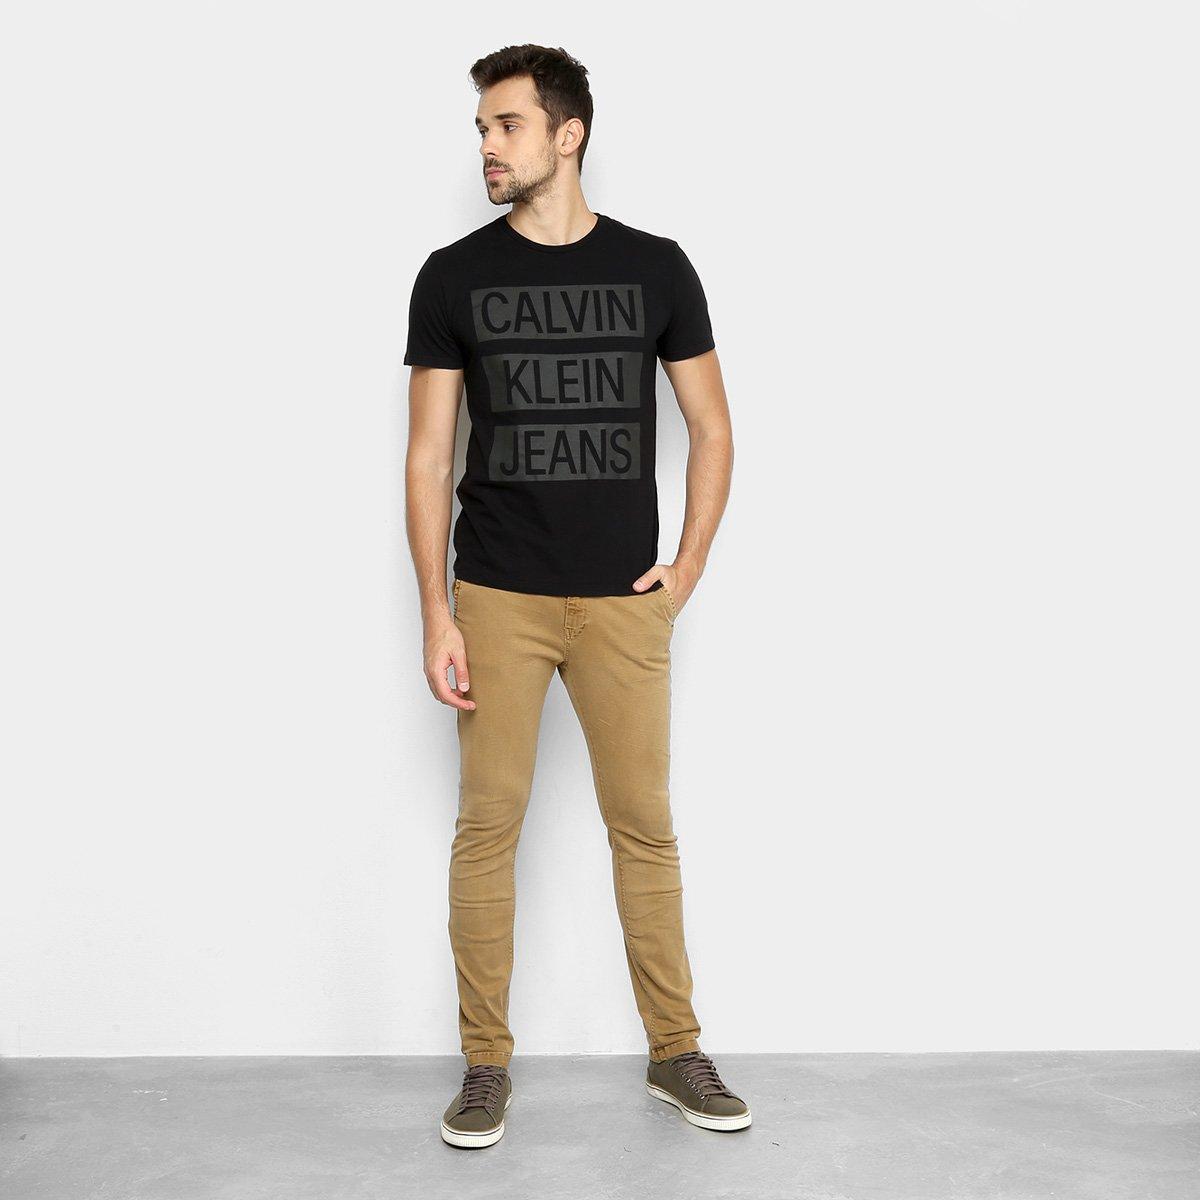 Camiseta Calvin Klein CK Jeans Masculina - Preto